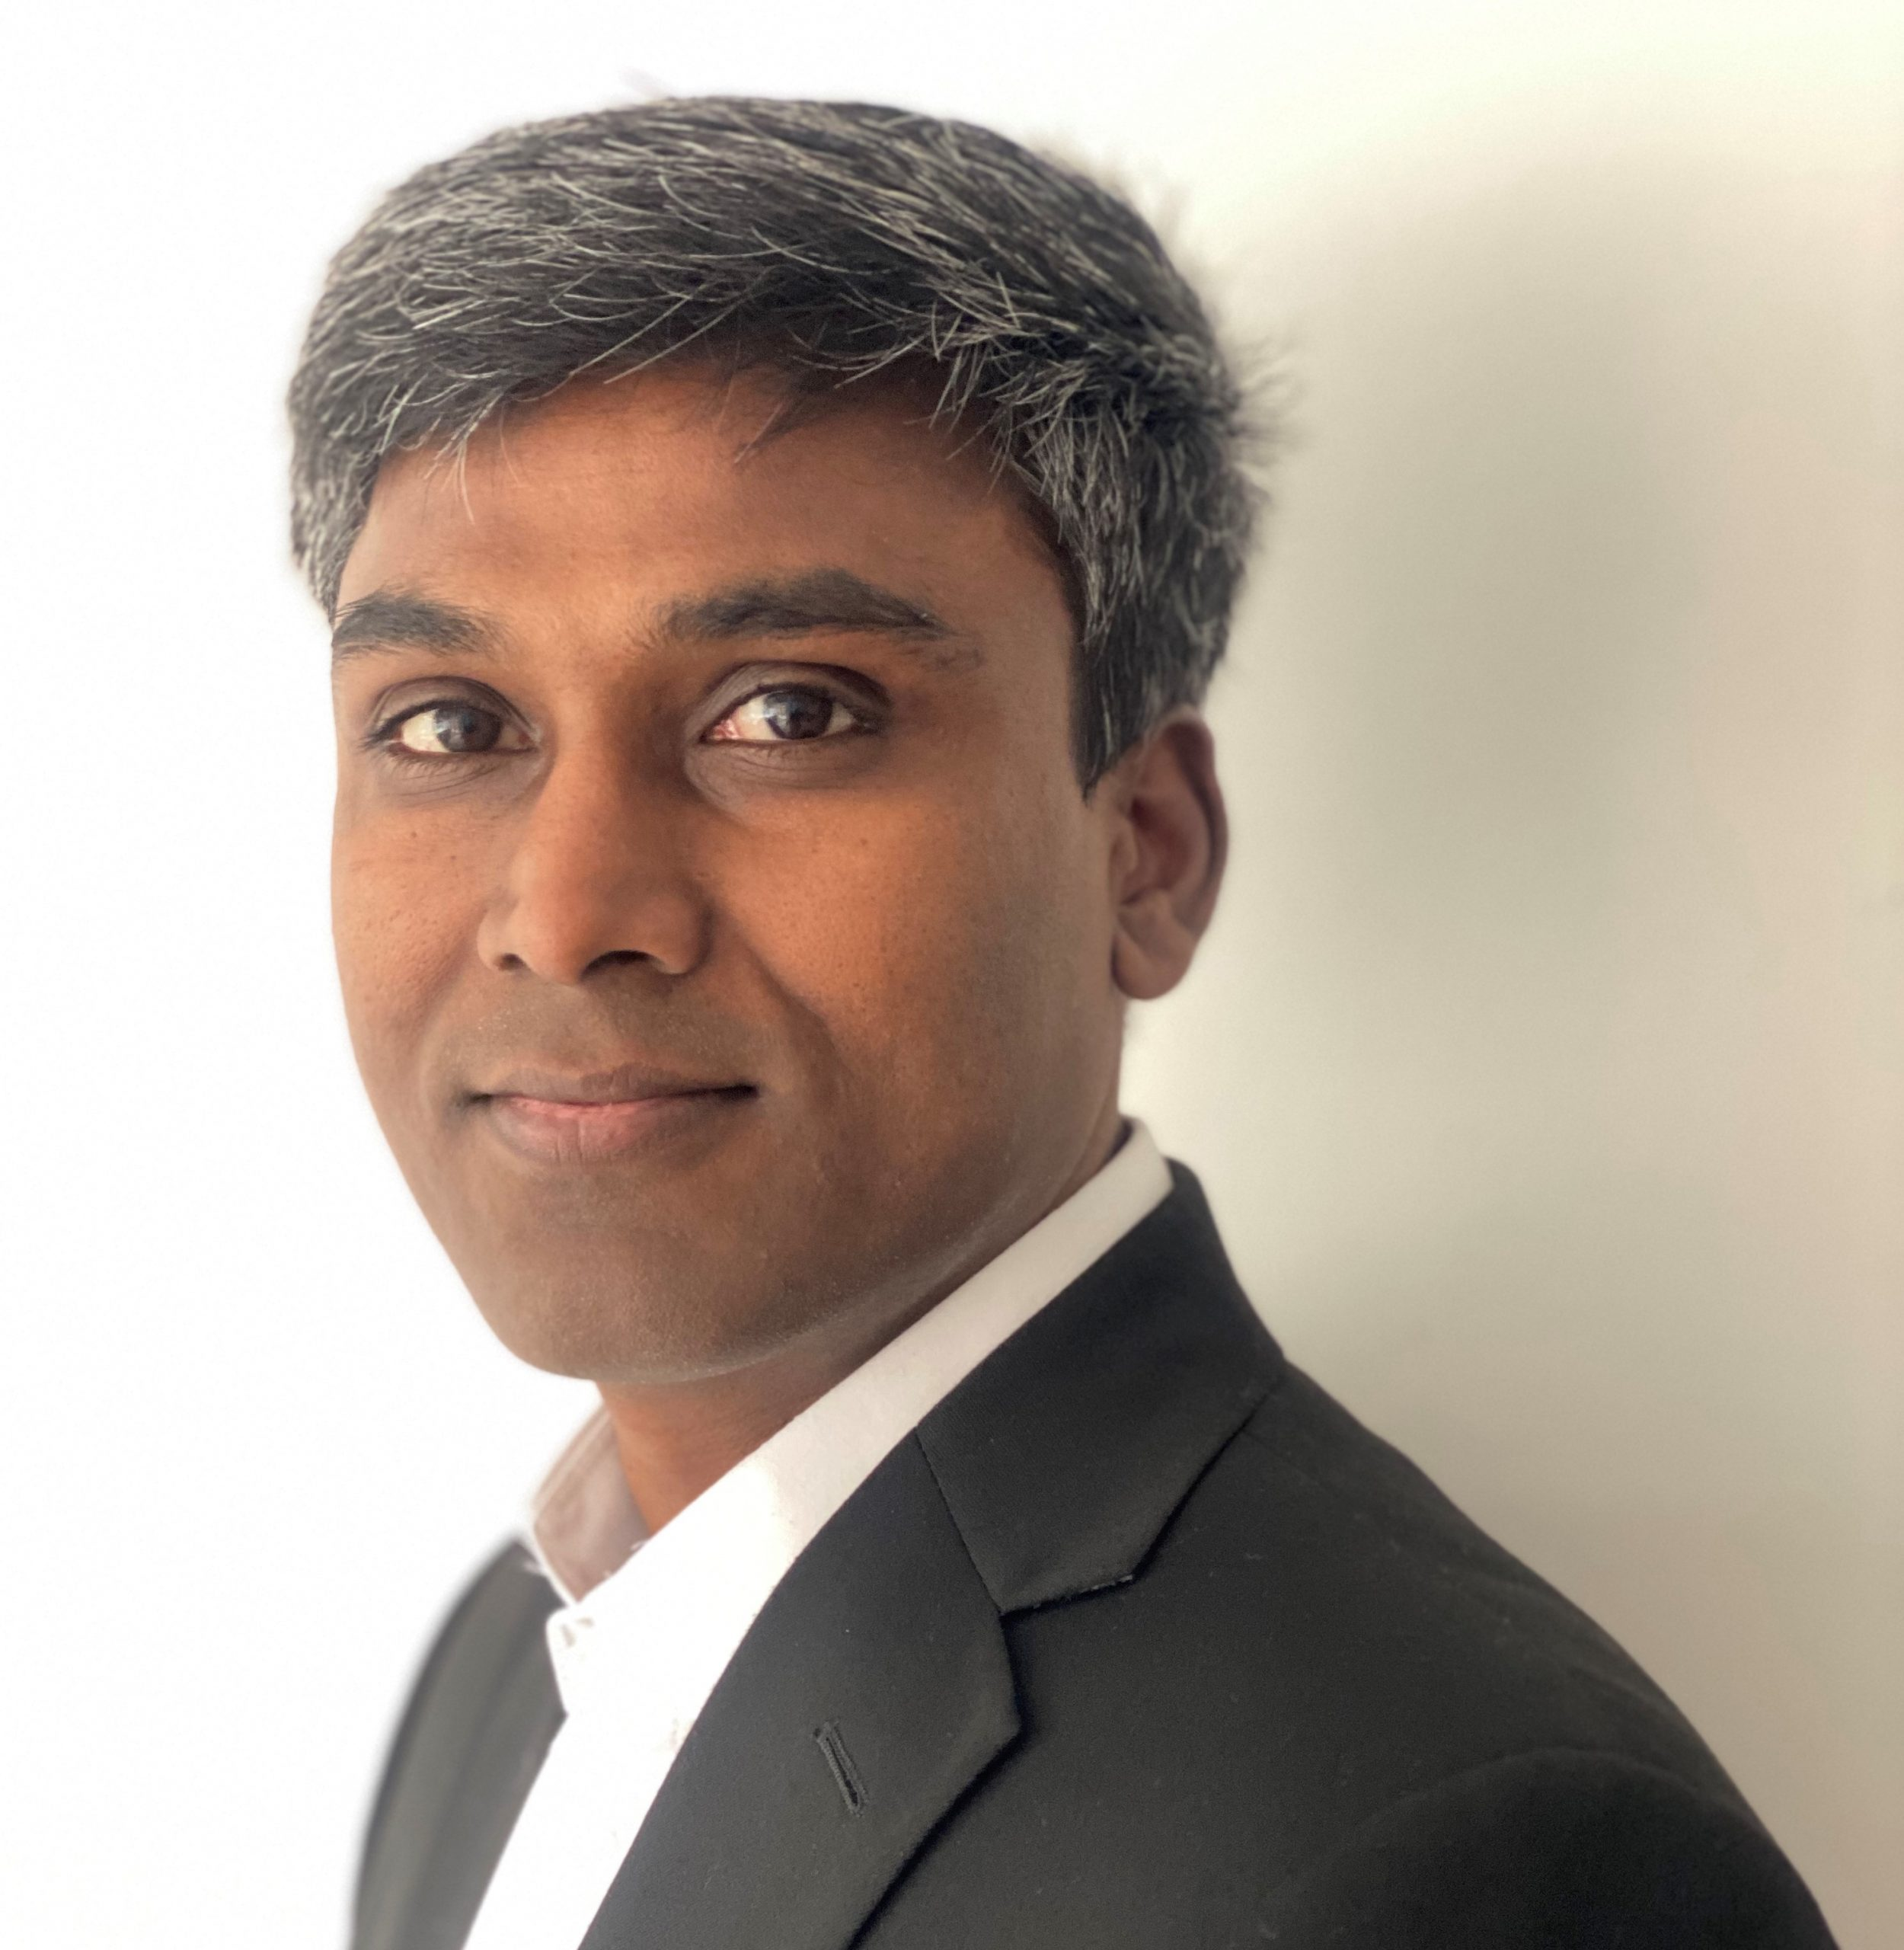 Anand Parkunan MSc PT (Keele University), MSK Ultrasound (University of East London), PG Clinical Research (Cambridge)